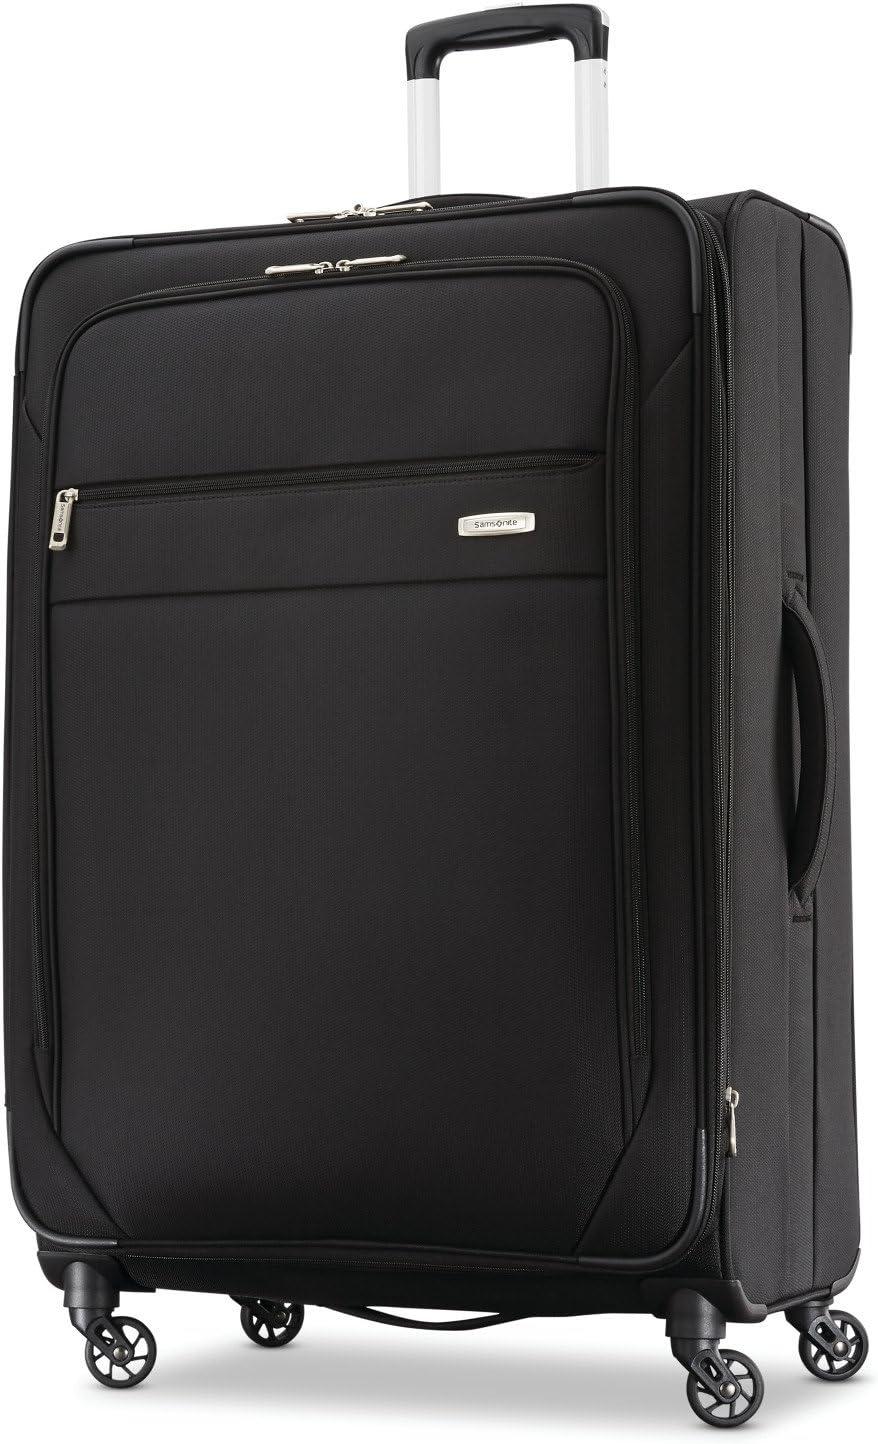 Samsonite Advena Softside Expandable Luggage with Spinner Wheels Black